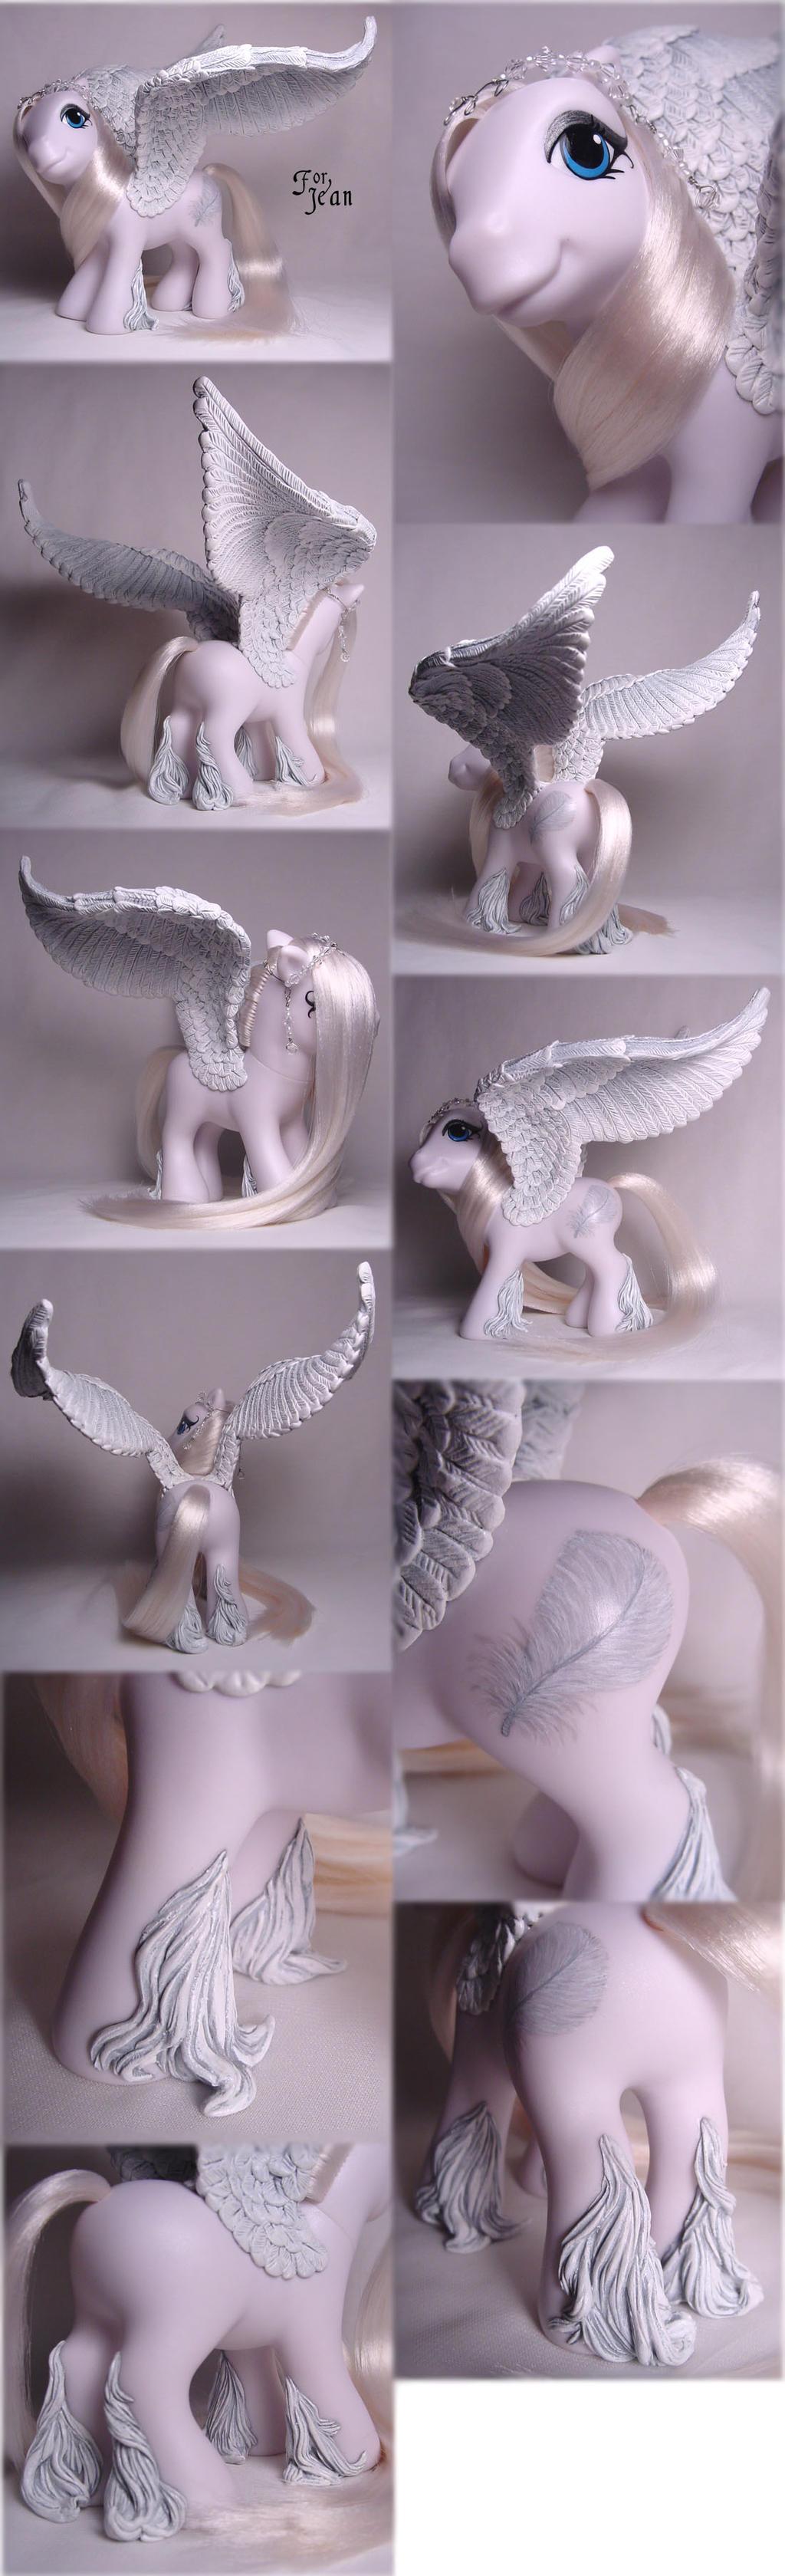 White Pegasus for Jean by Woosie